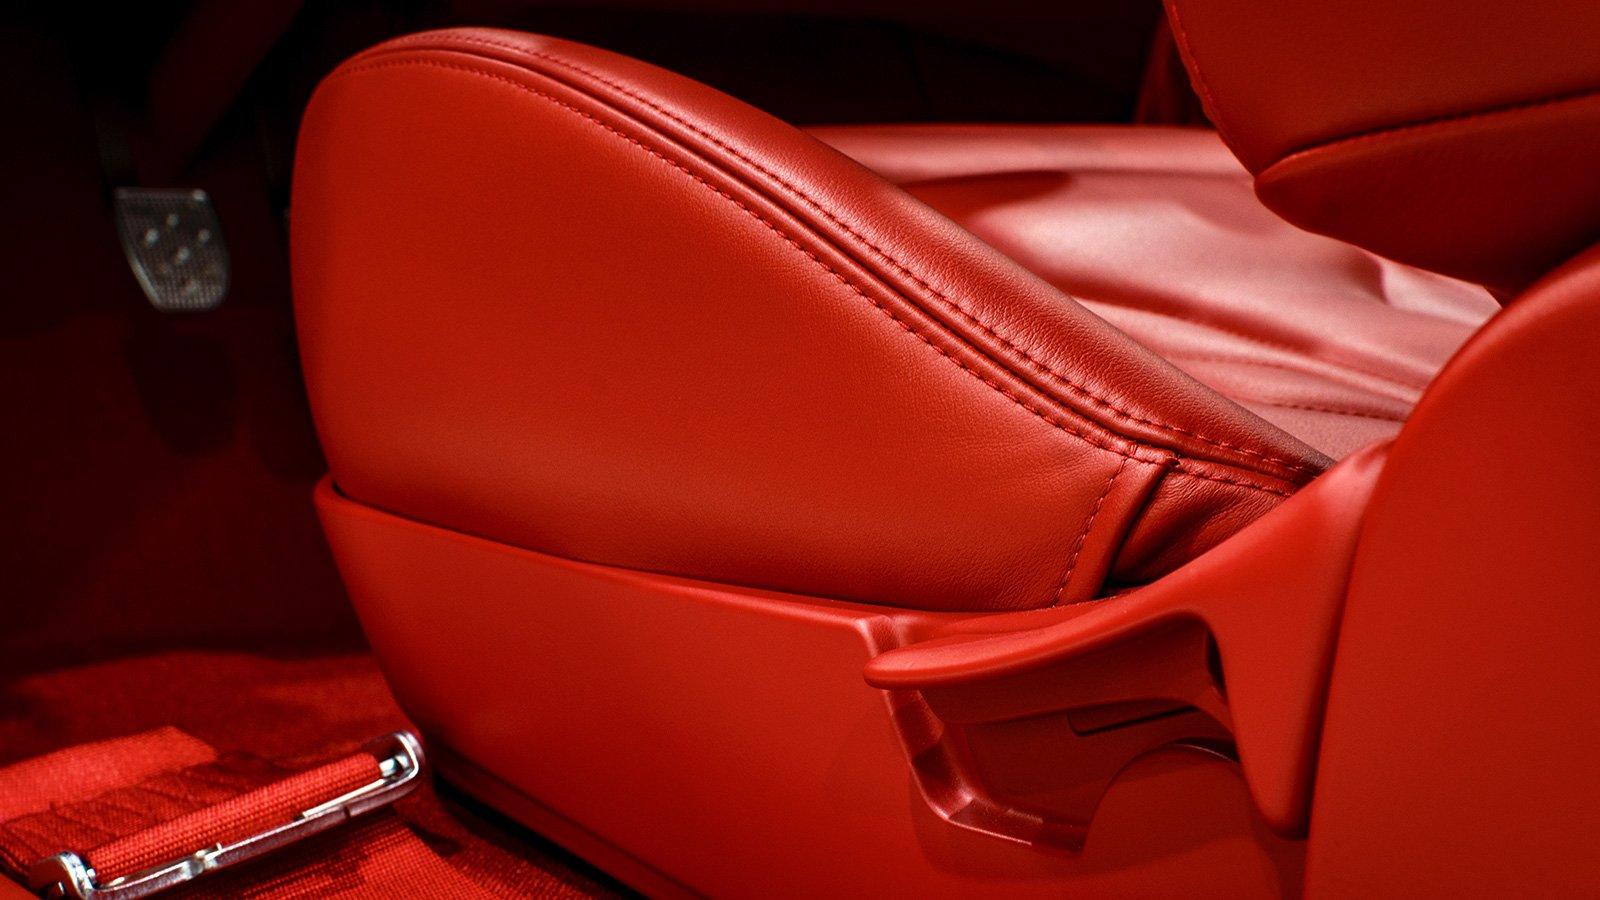 63-chevy-II-custom-seat-details